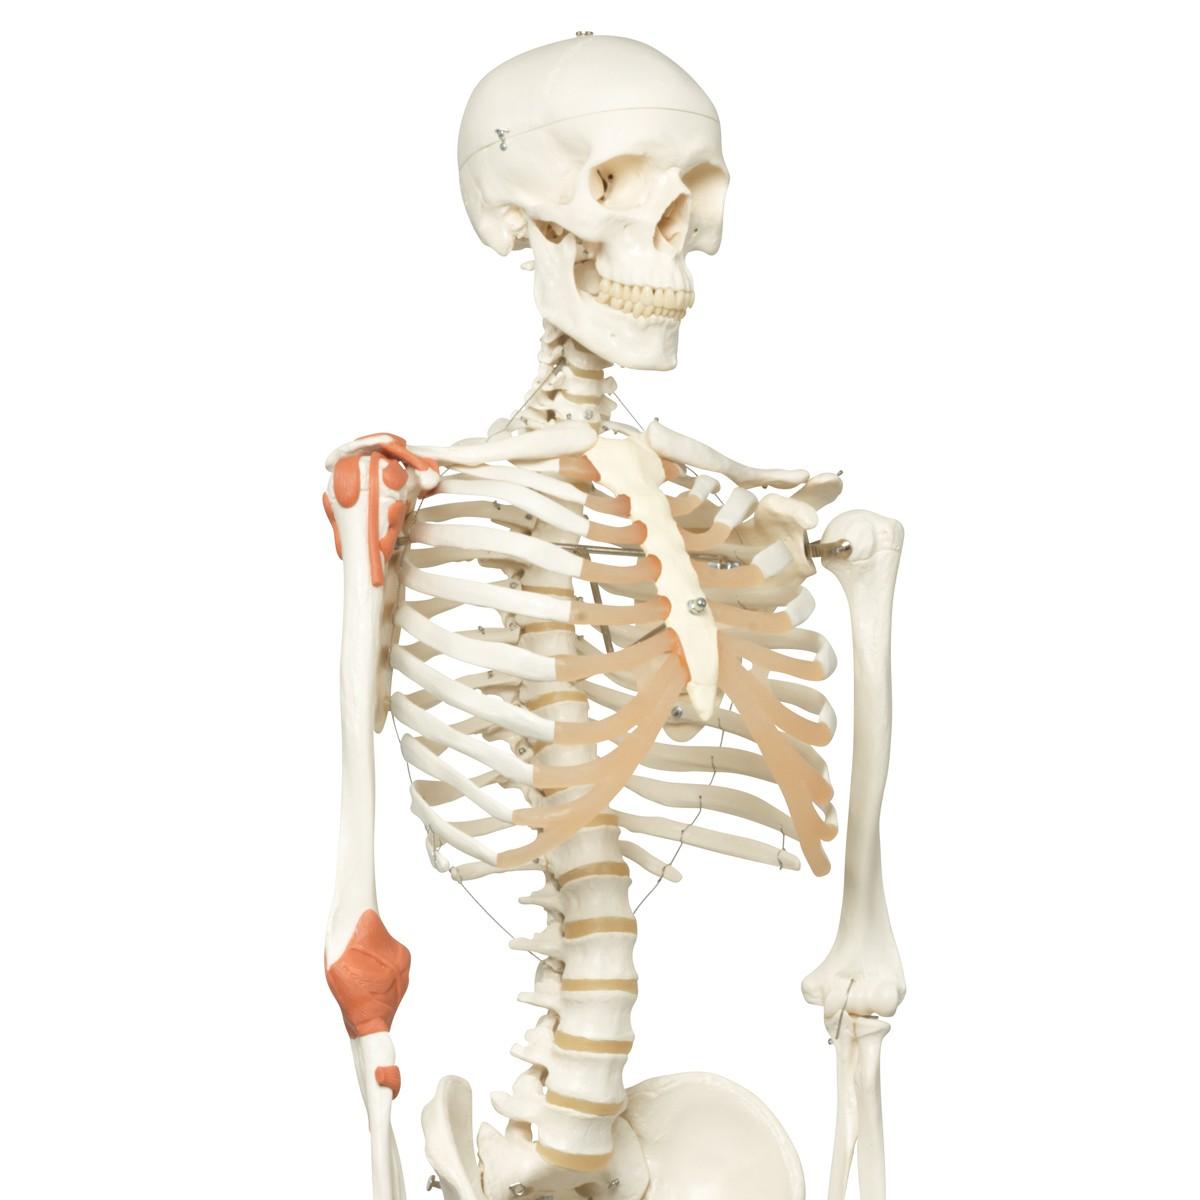 3b Scientific A12 Human Skeleton Mo